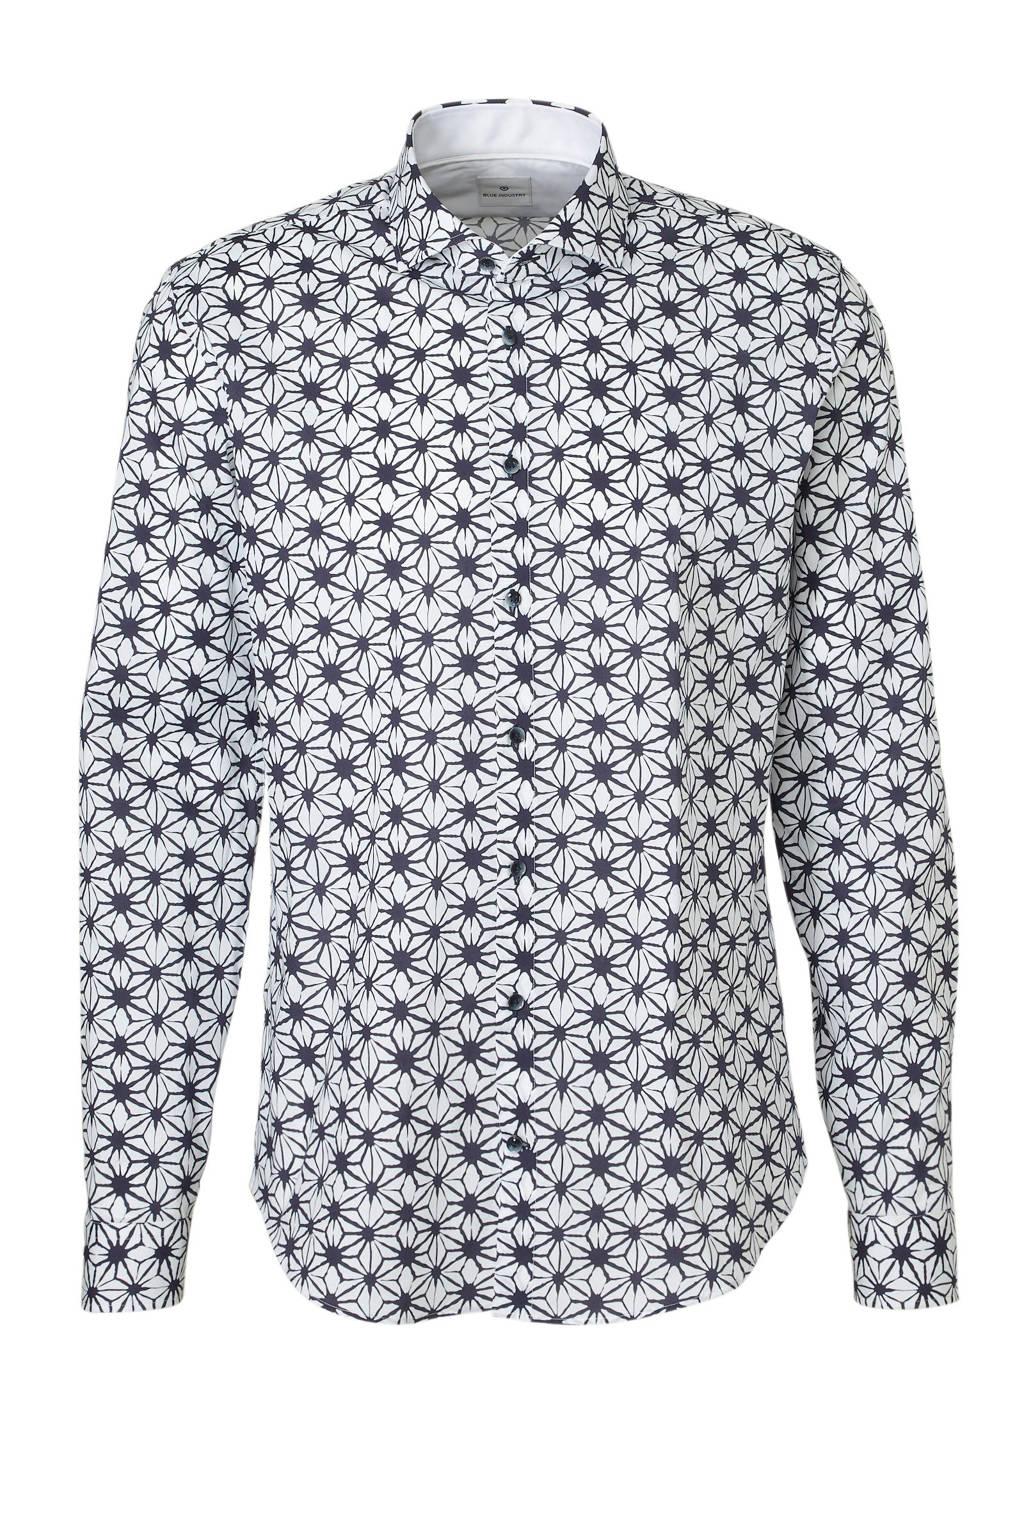 Blue Industry regular fit overhemd met print, Wit/marine